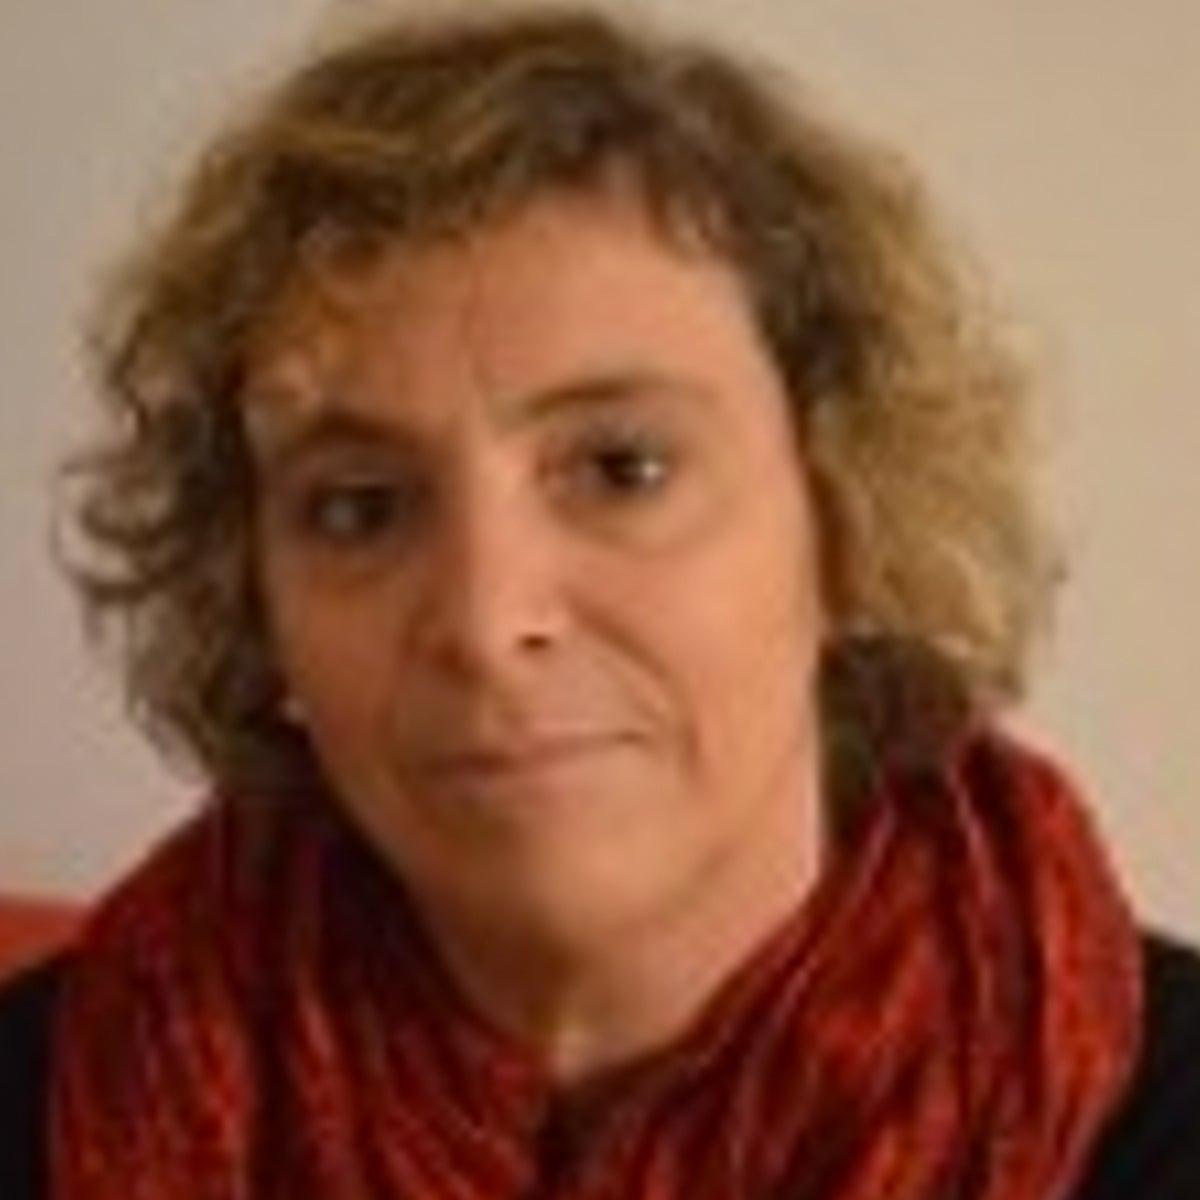 Veronica Adler